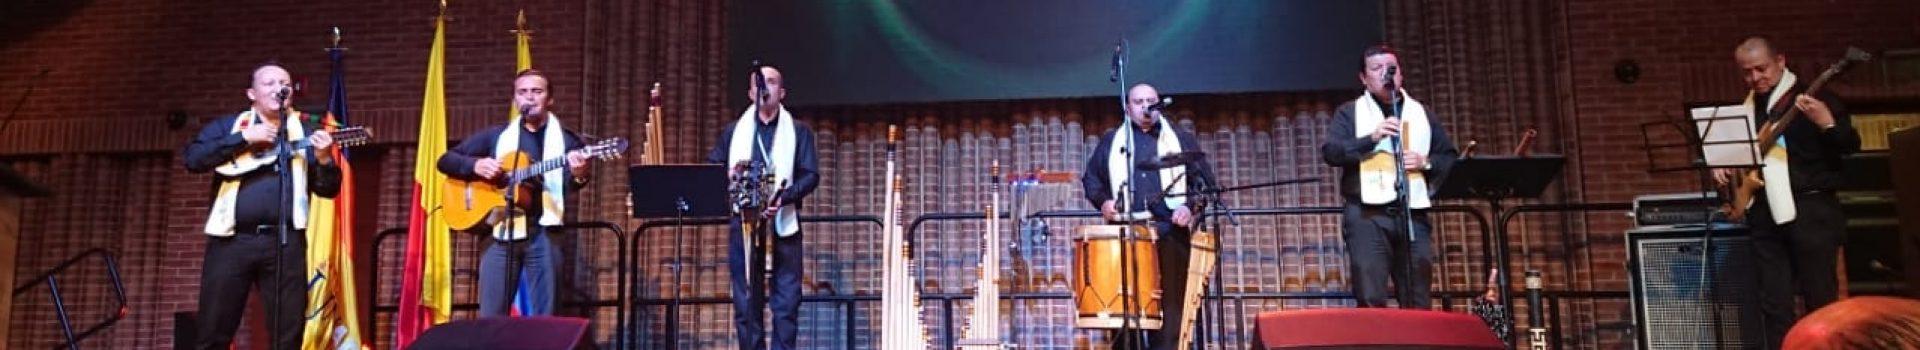 Siete Voces – Música Latinoamericana